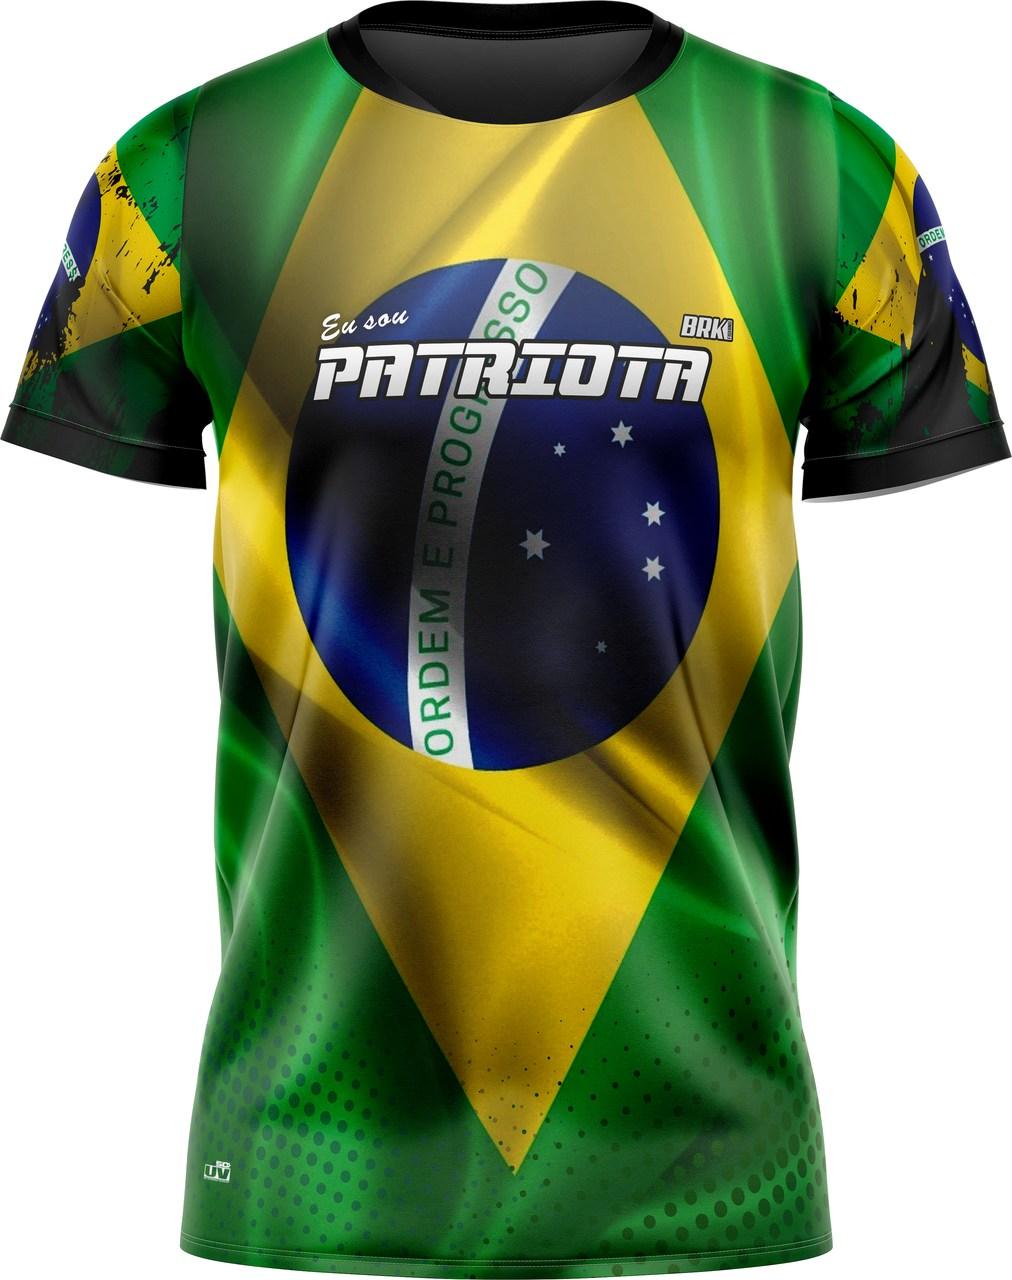 Camiseta Bandeira do Brasil Patriota Brk com UV50+